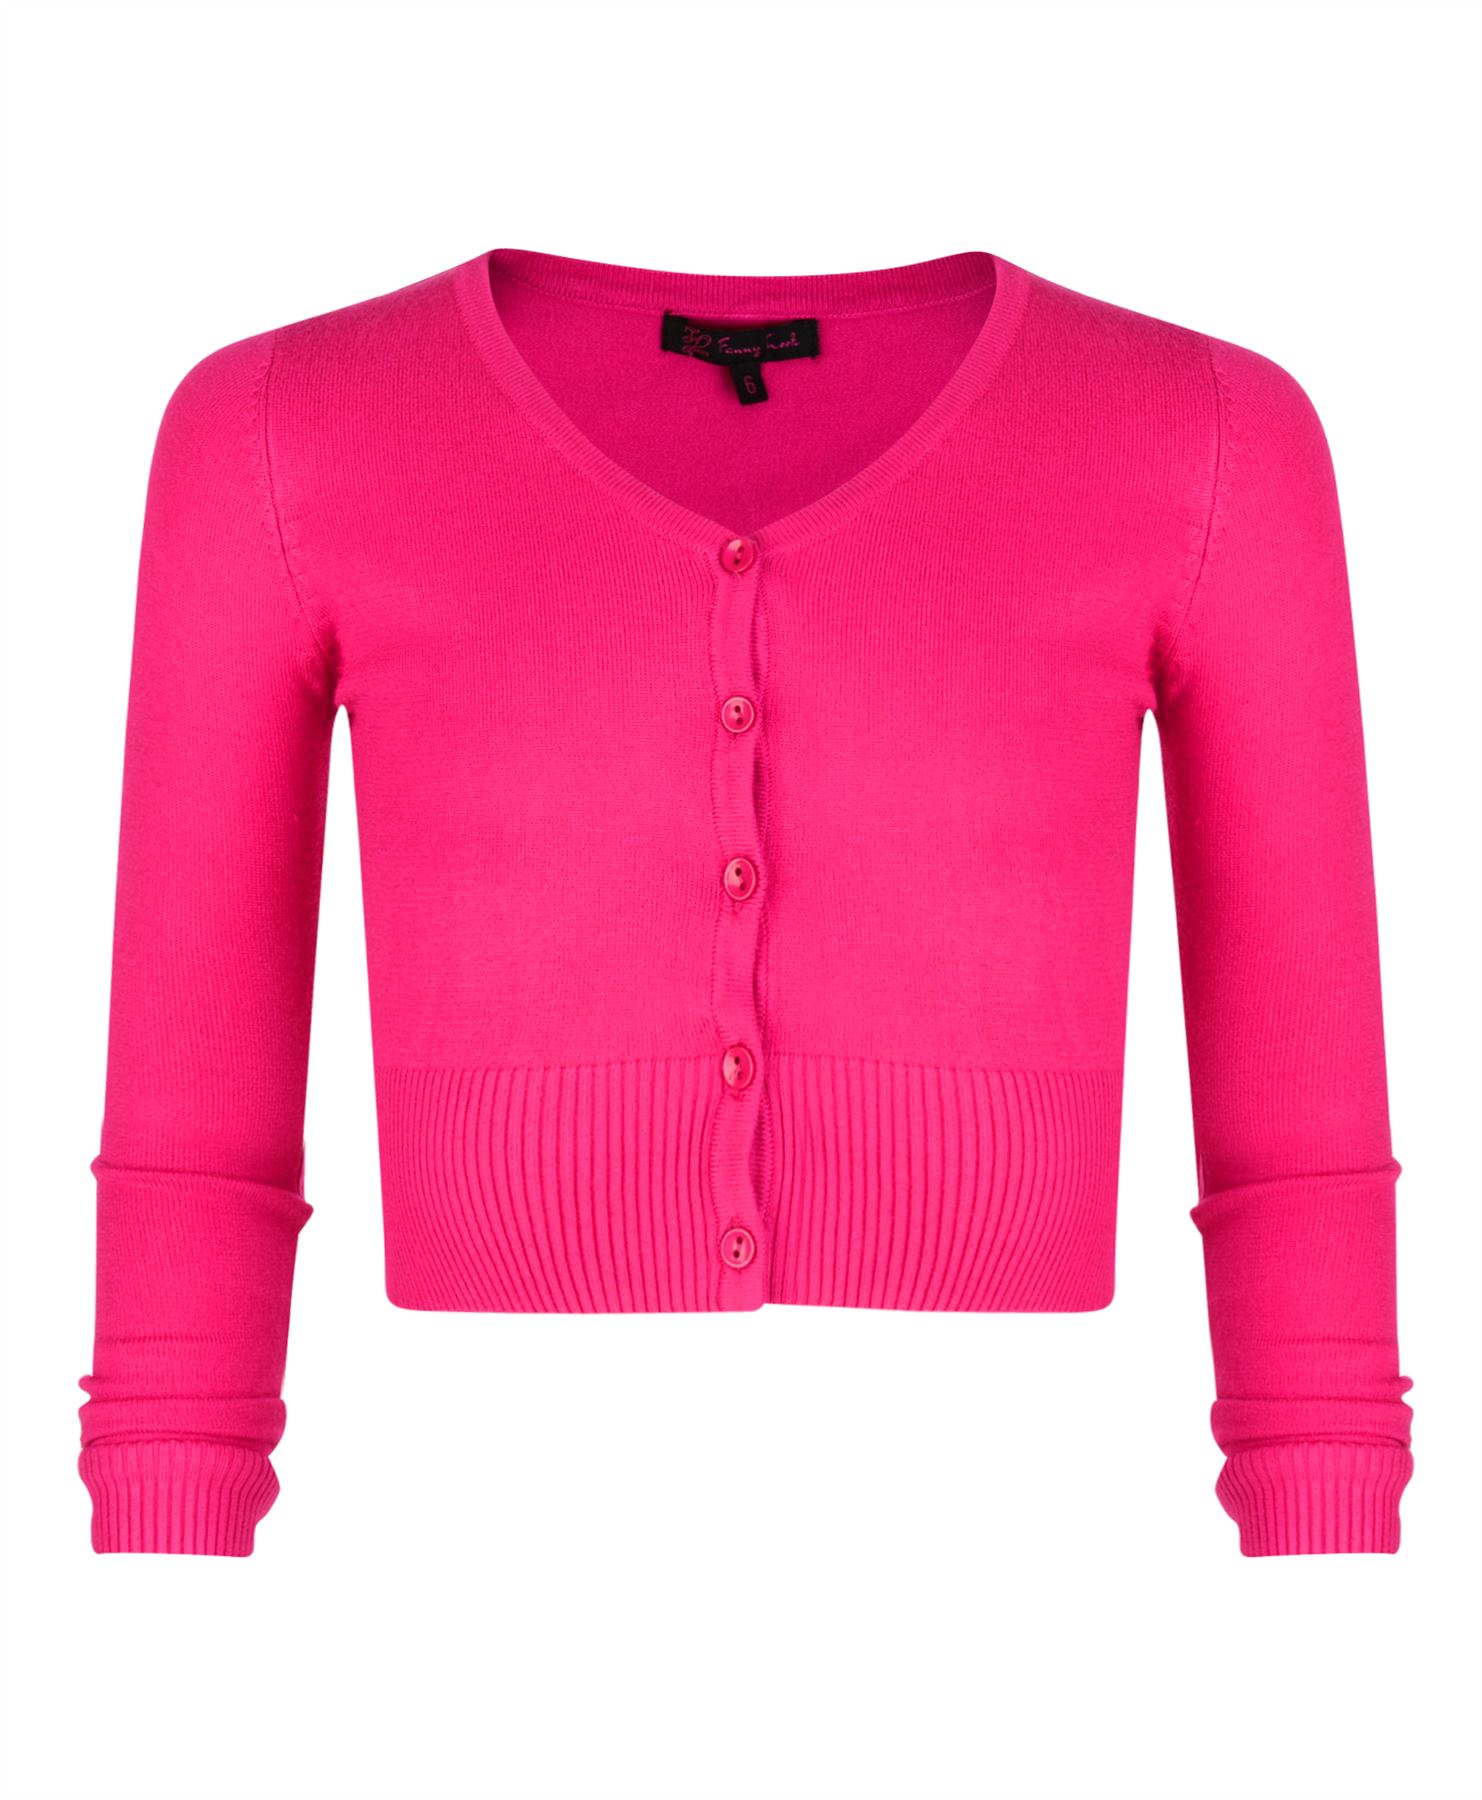 Girls Fine Knit Cropped V-neck Cardigan Kids Long Sleeve Sweater ...